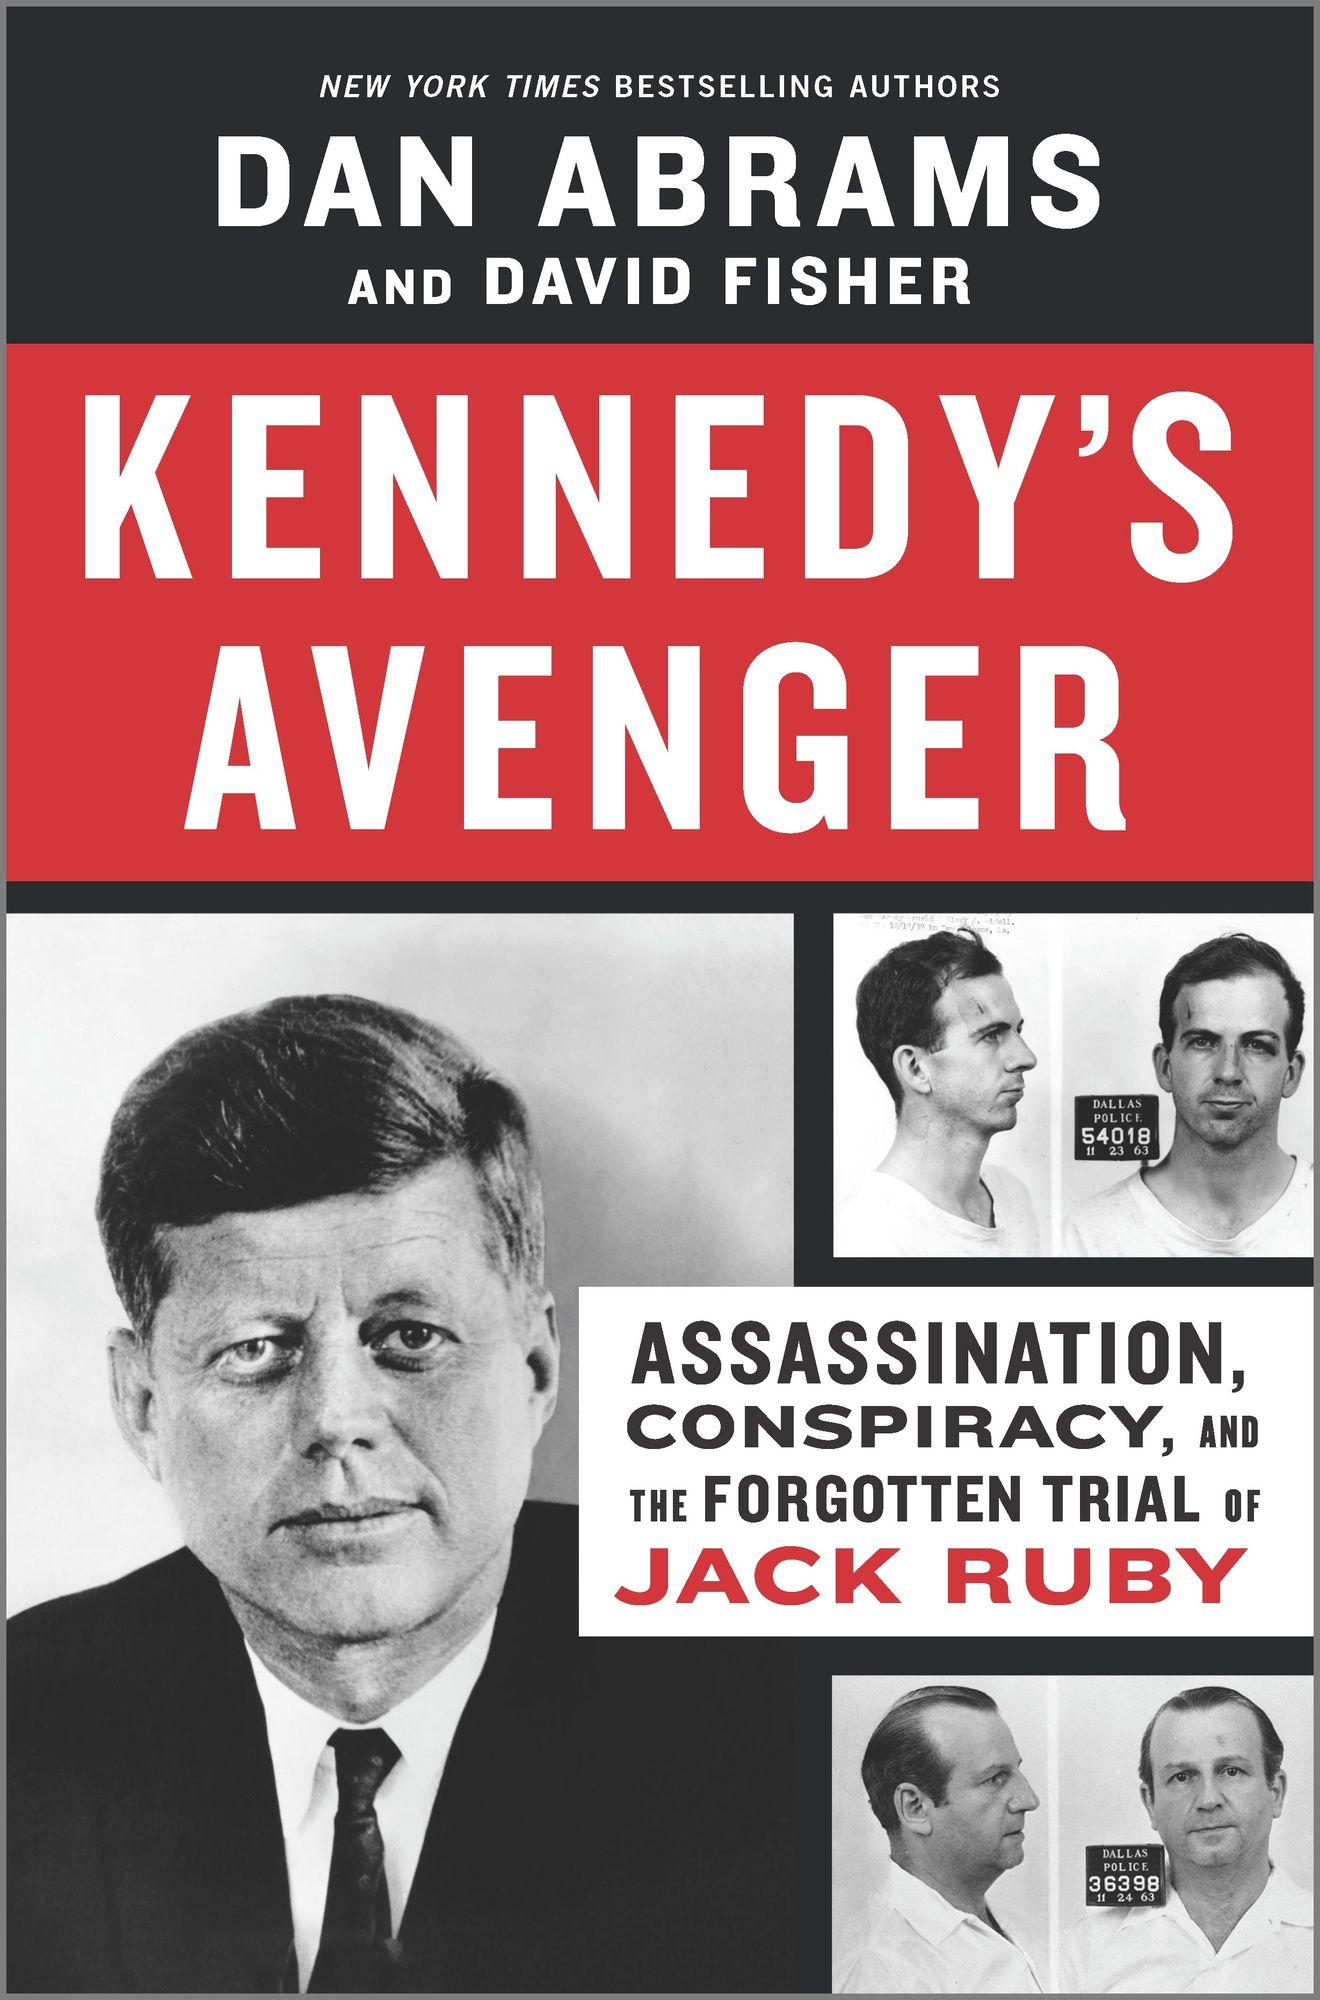 Kennedy's Avenger by Dan Abrams